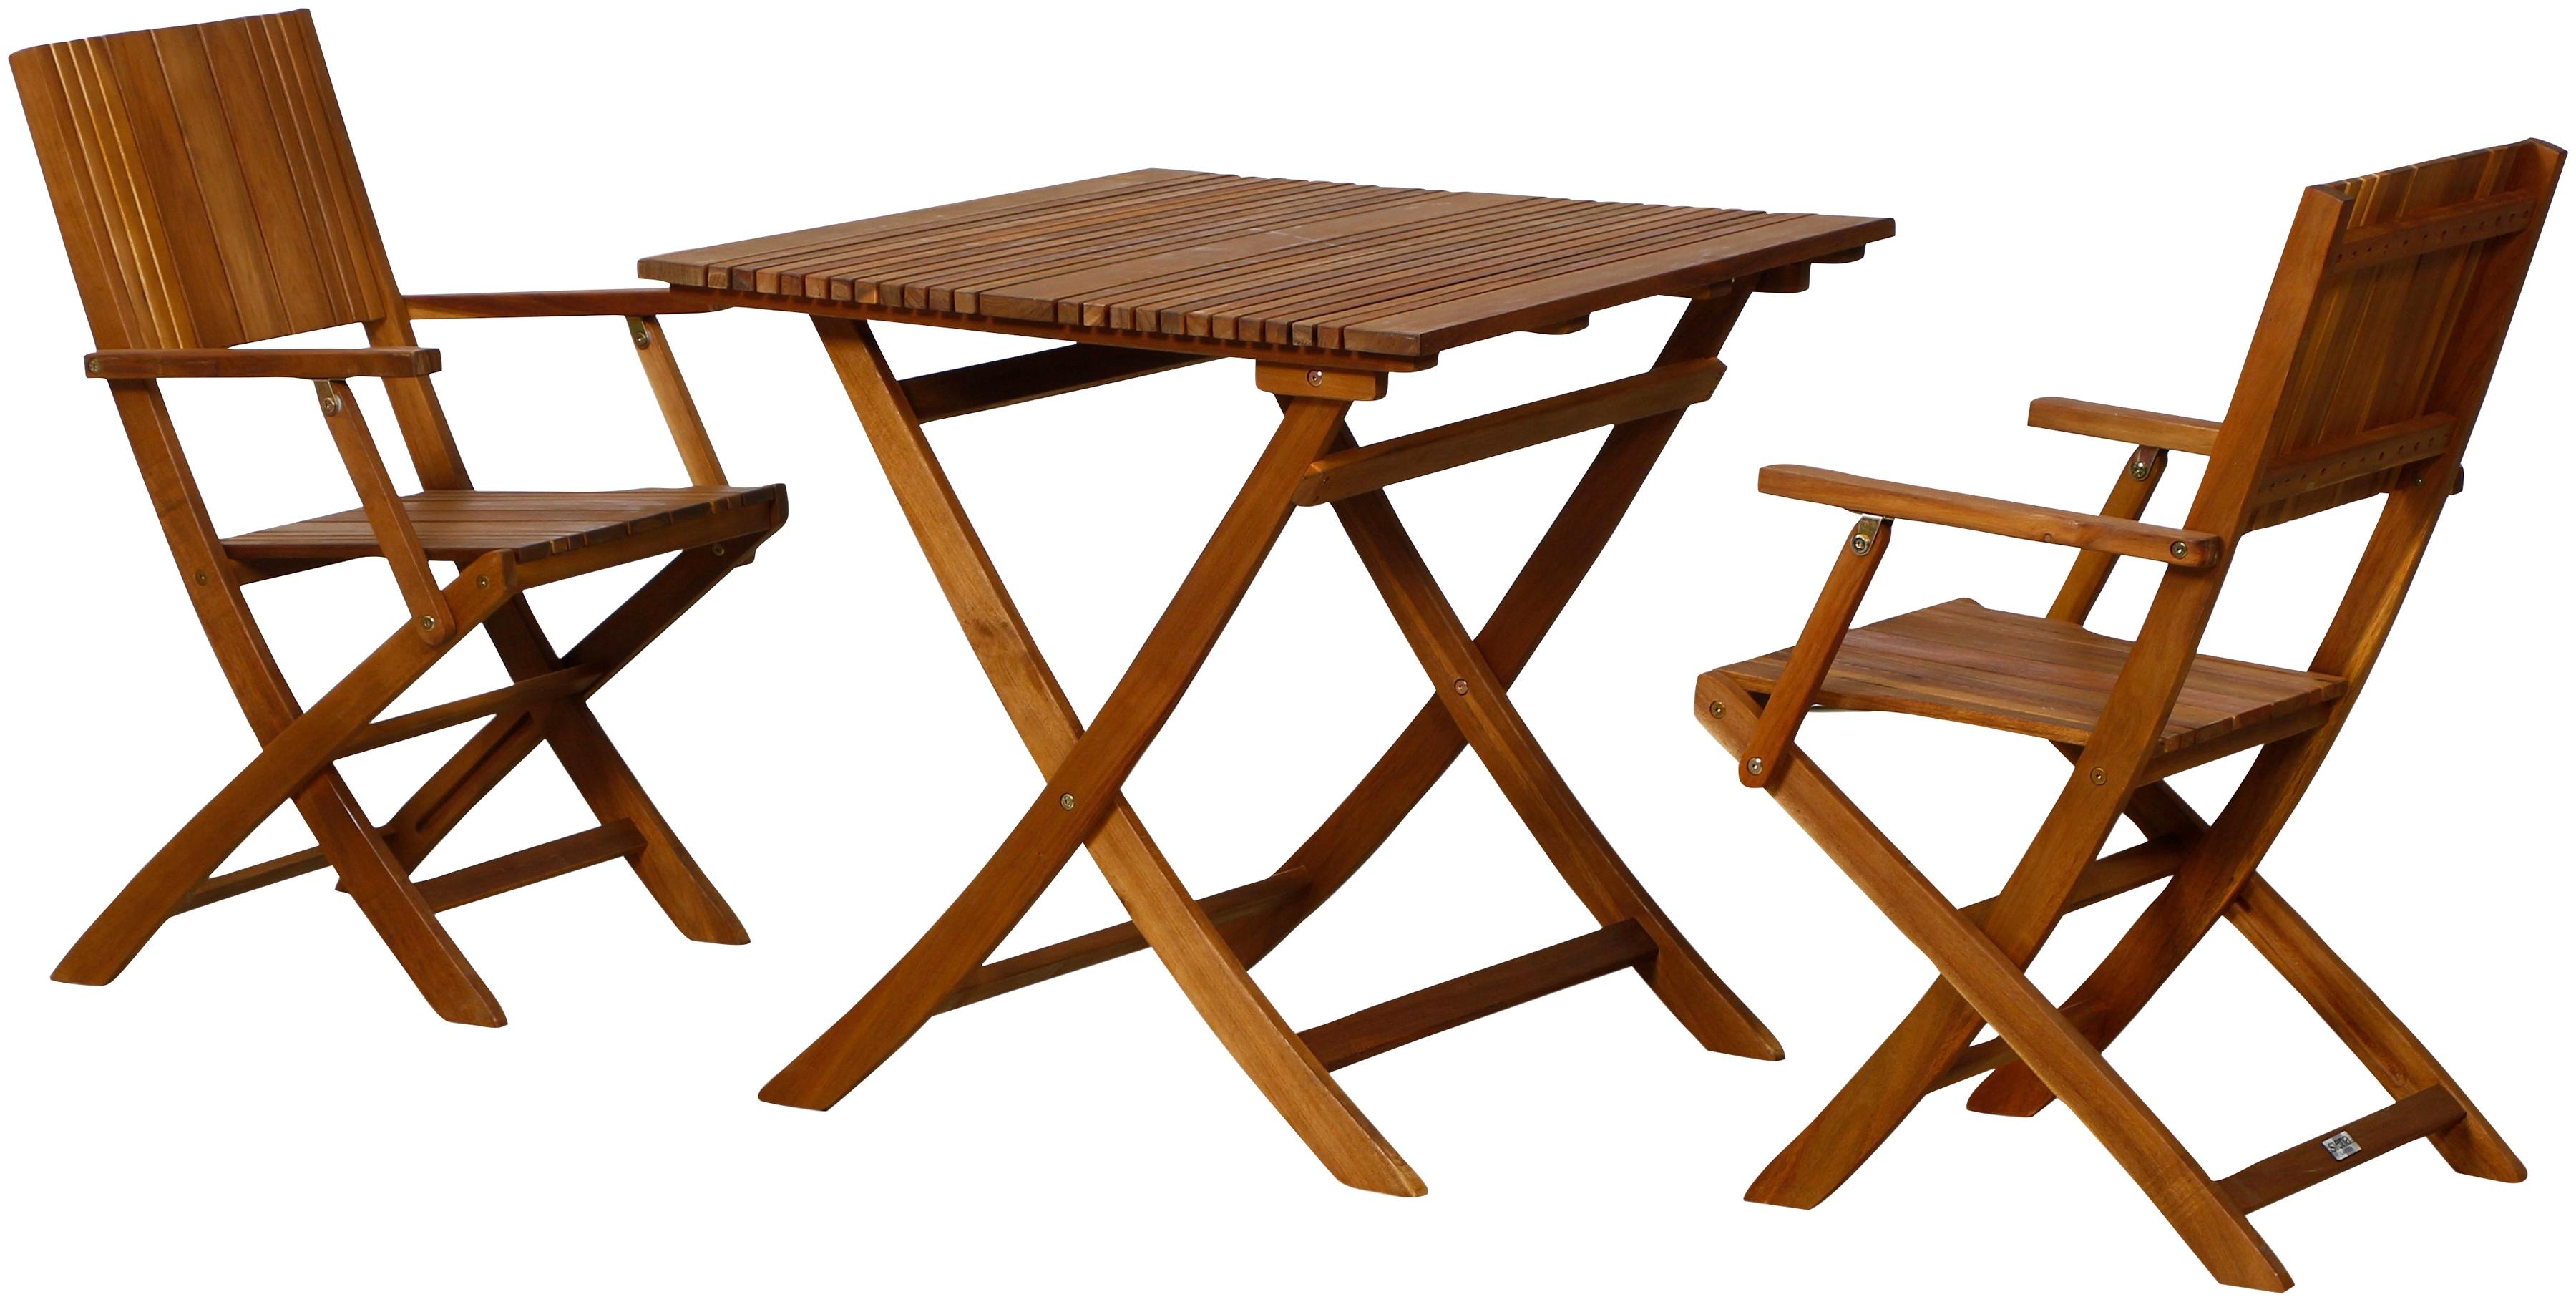 SIENA GARDEN Gartenmöbelset Falun SET 3-tlg Akazienholz 2 Sessel Tisch 80x80 cm